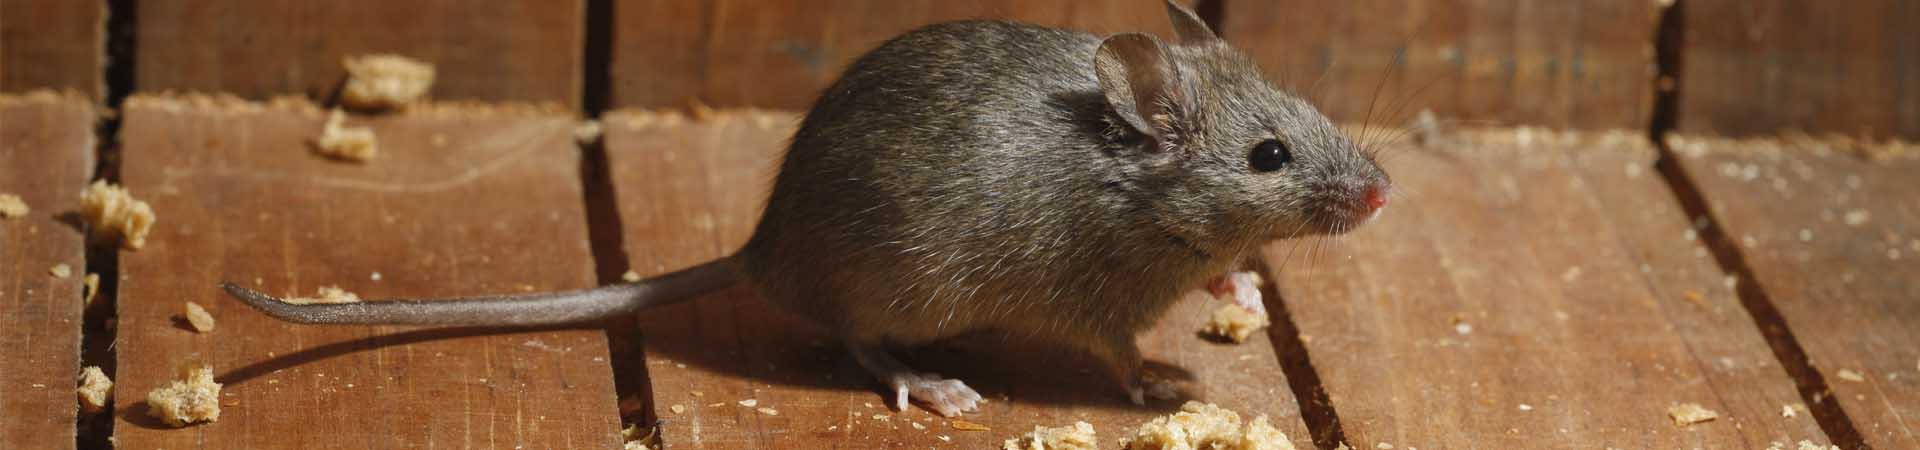 1920w-450h-slider-rodents2